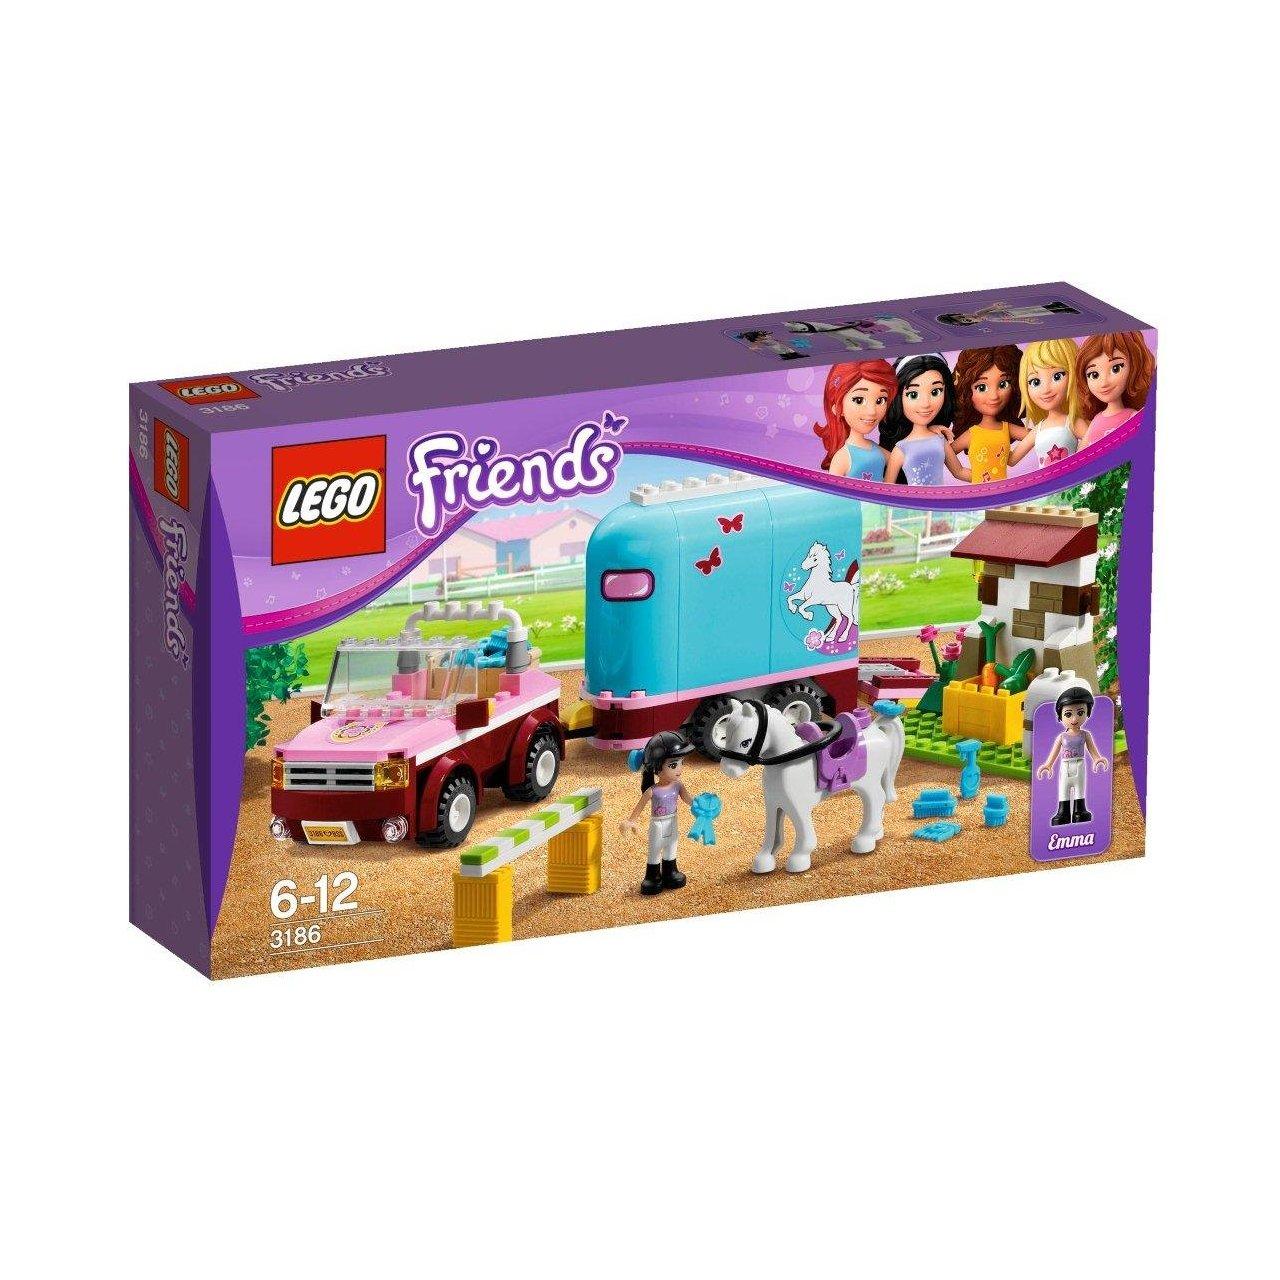 Hgtv Home Decor Ideas Lego Friends Inspire Girls Globally Friends Sets 2012